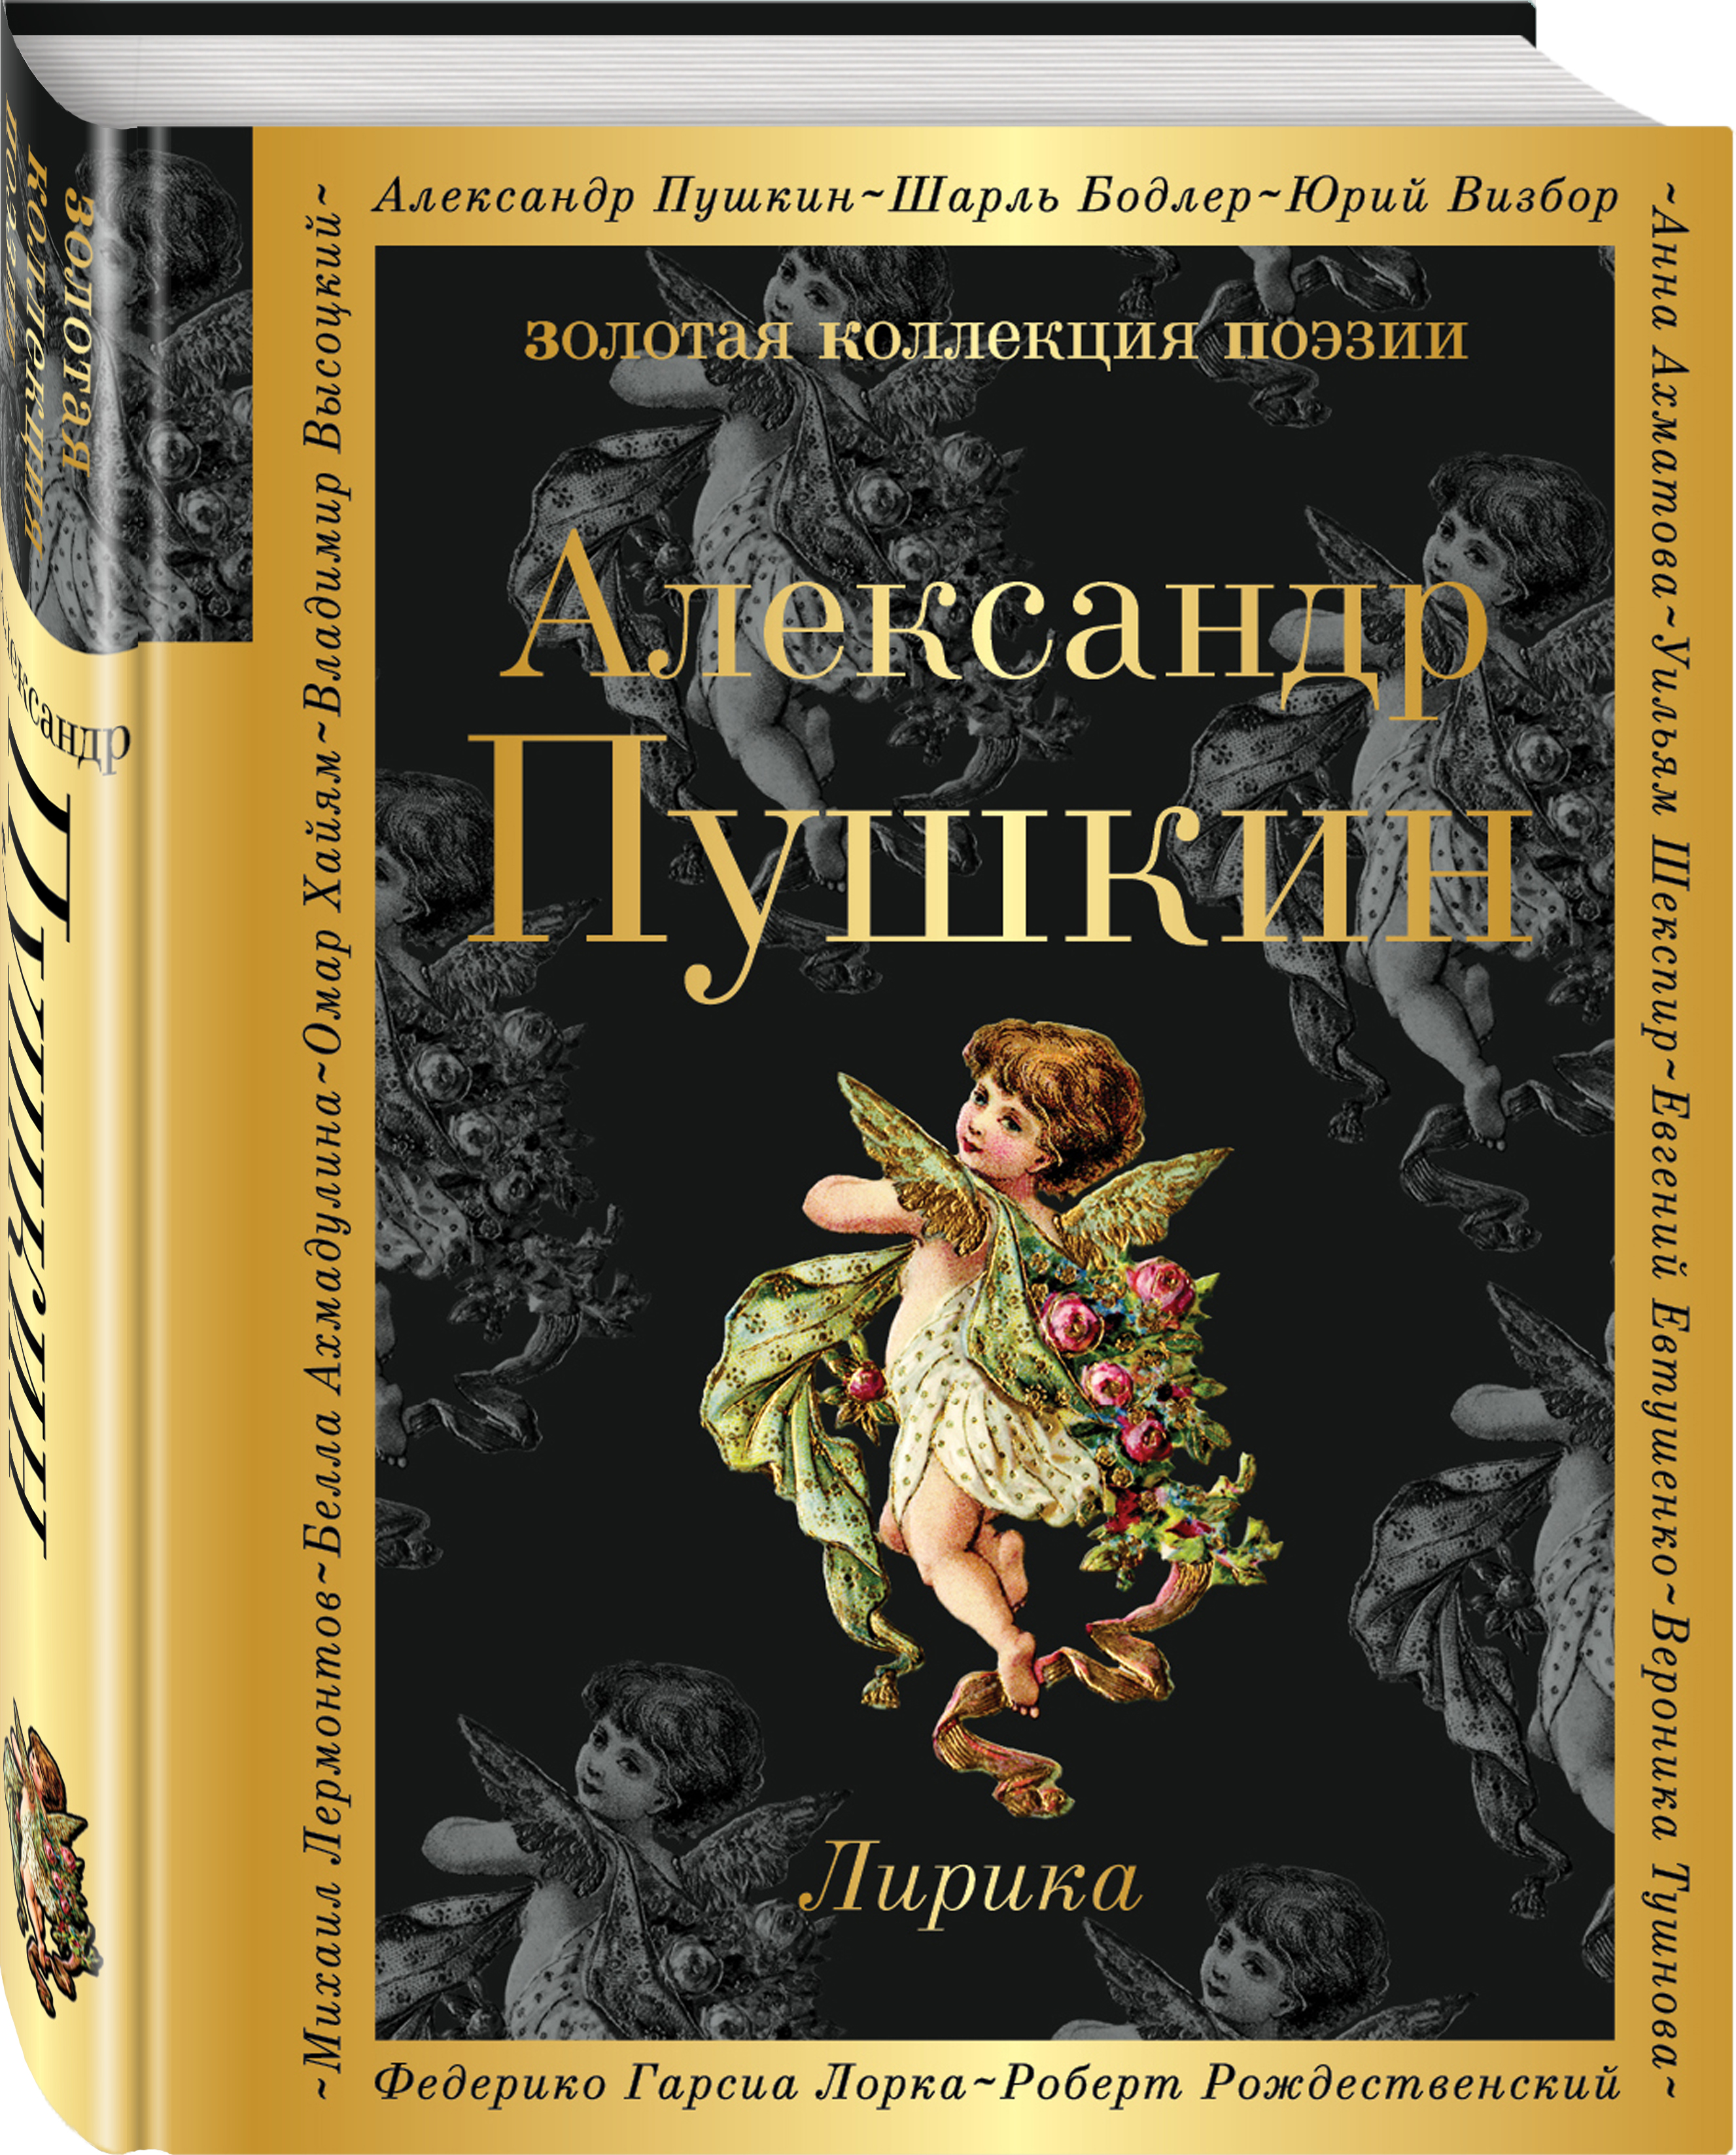 Александр Пушкин Лирика пушкин александр сергеевич я помню чудное мгновенье стихотворения